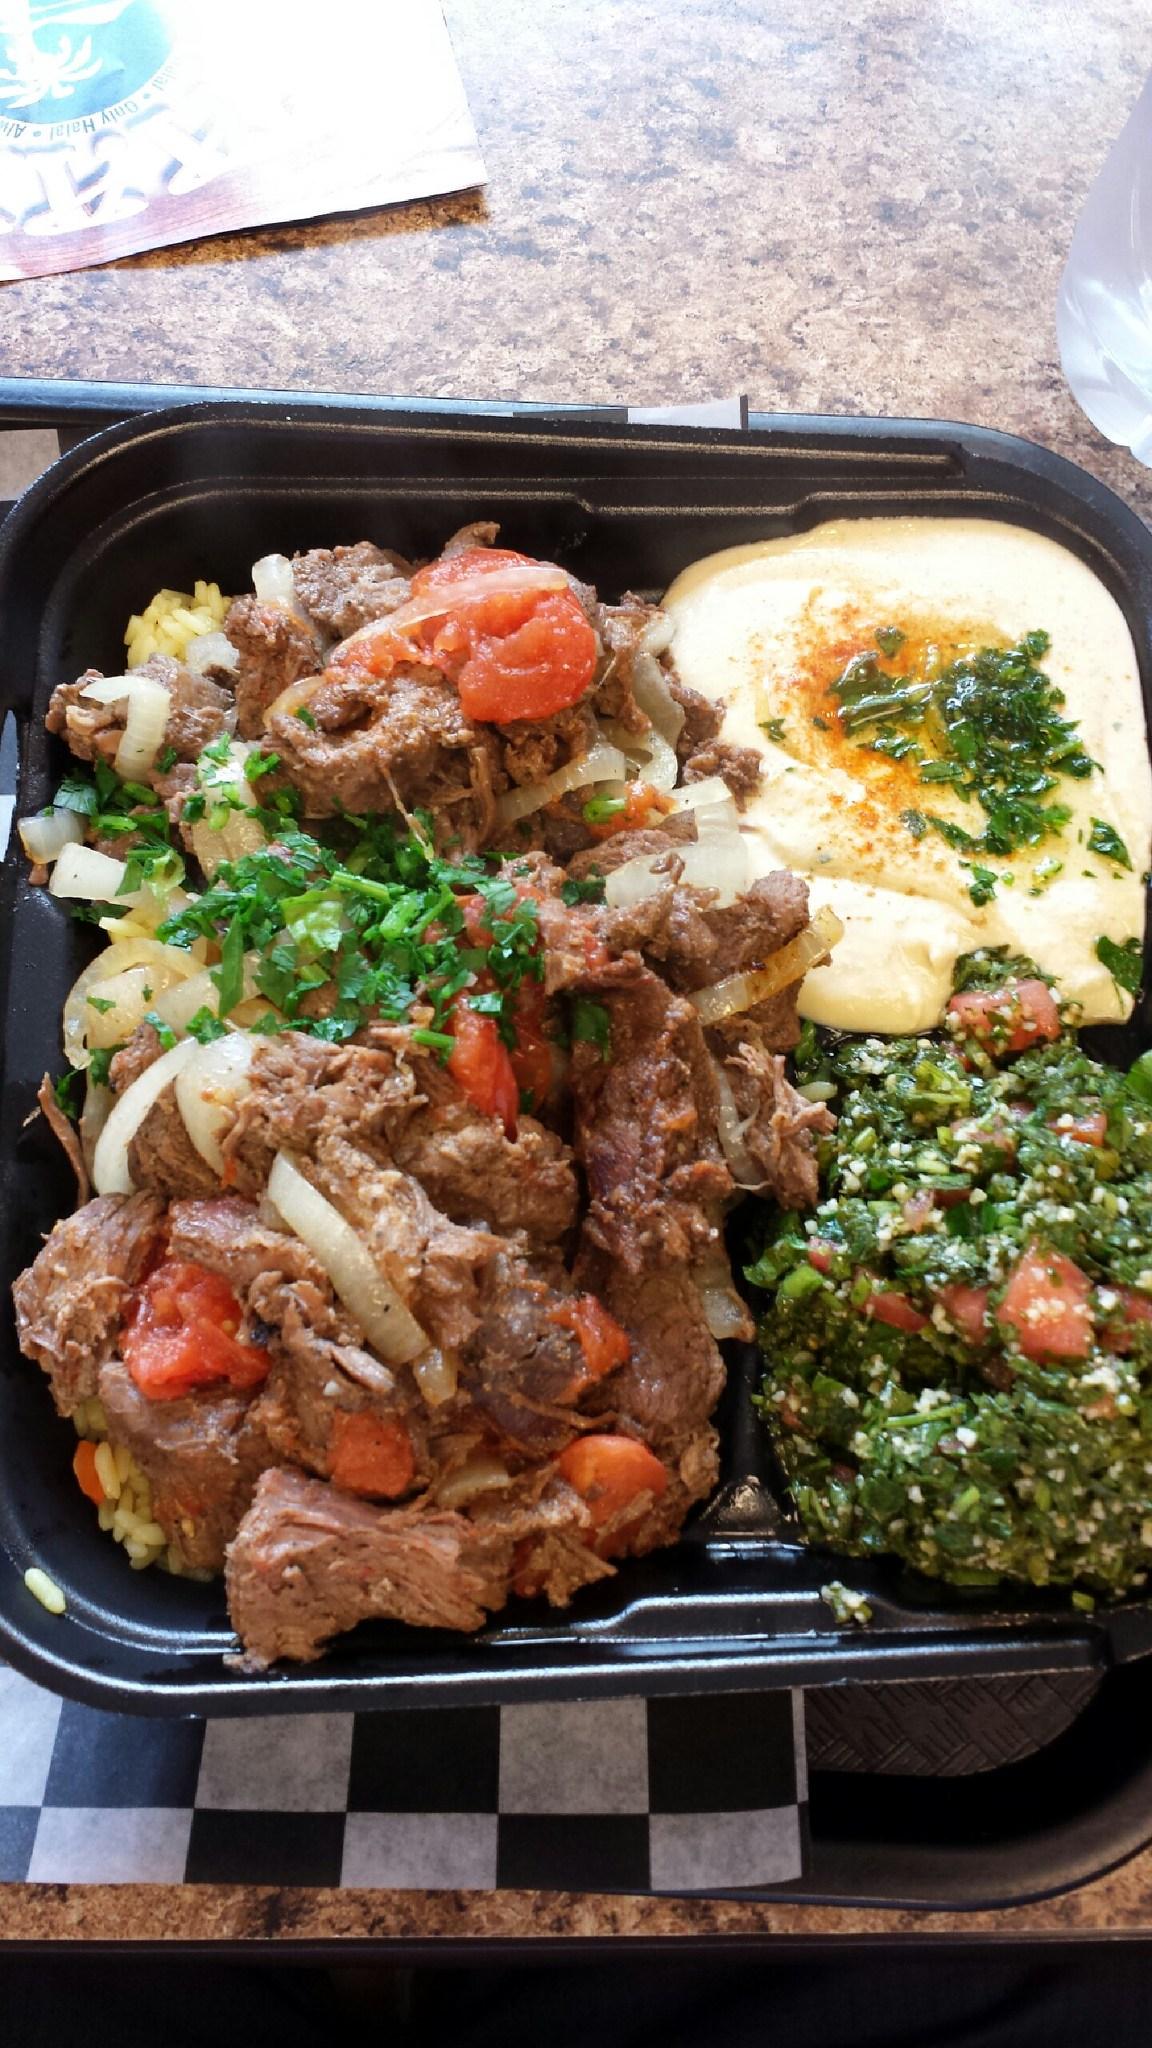 Saad's Shawarma and Fish Platters - 7 Oct 2013